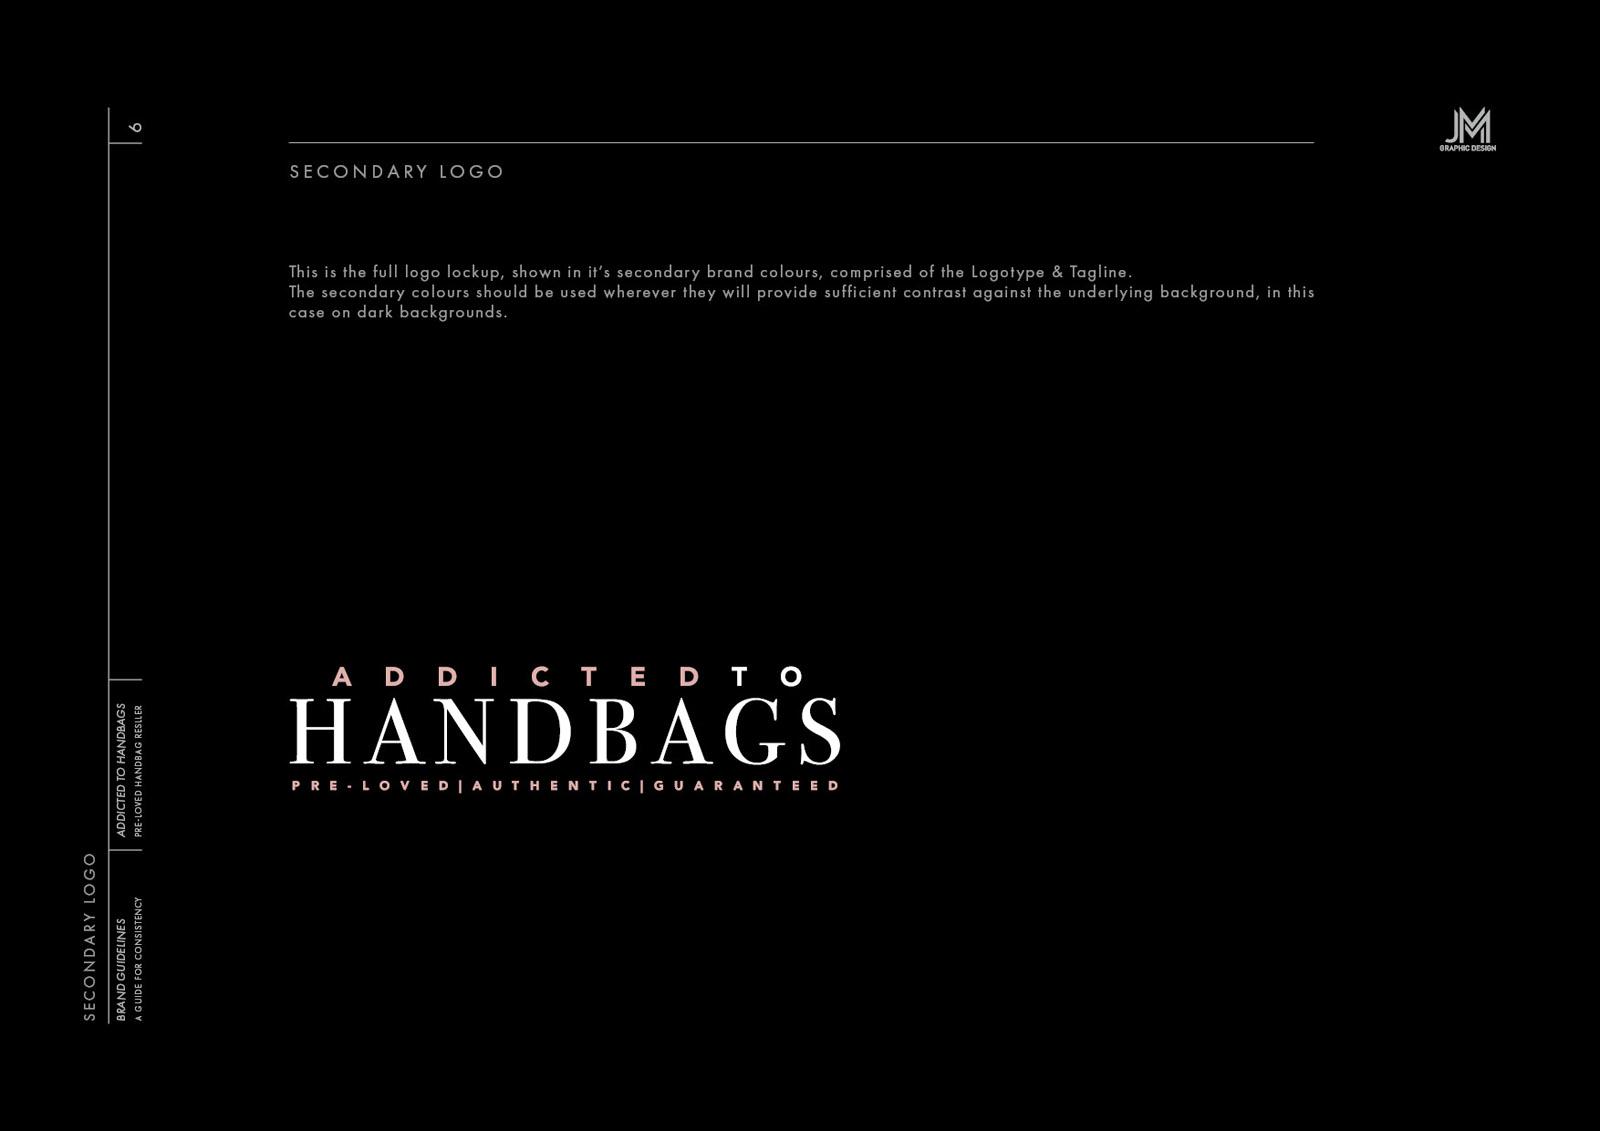 handbag-luxury-brand-identity-logo-design04